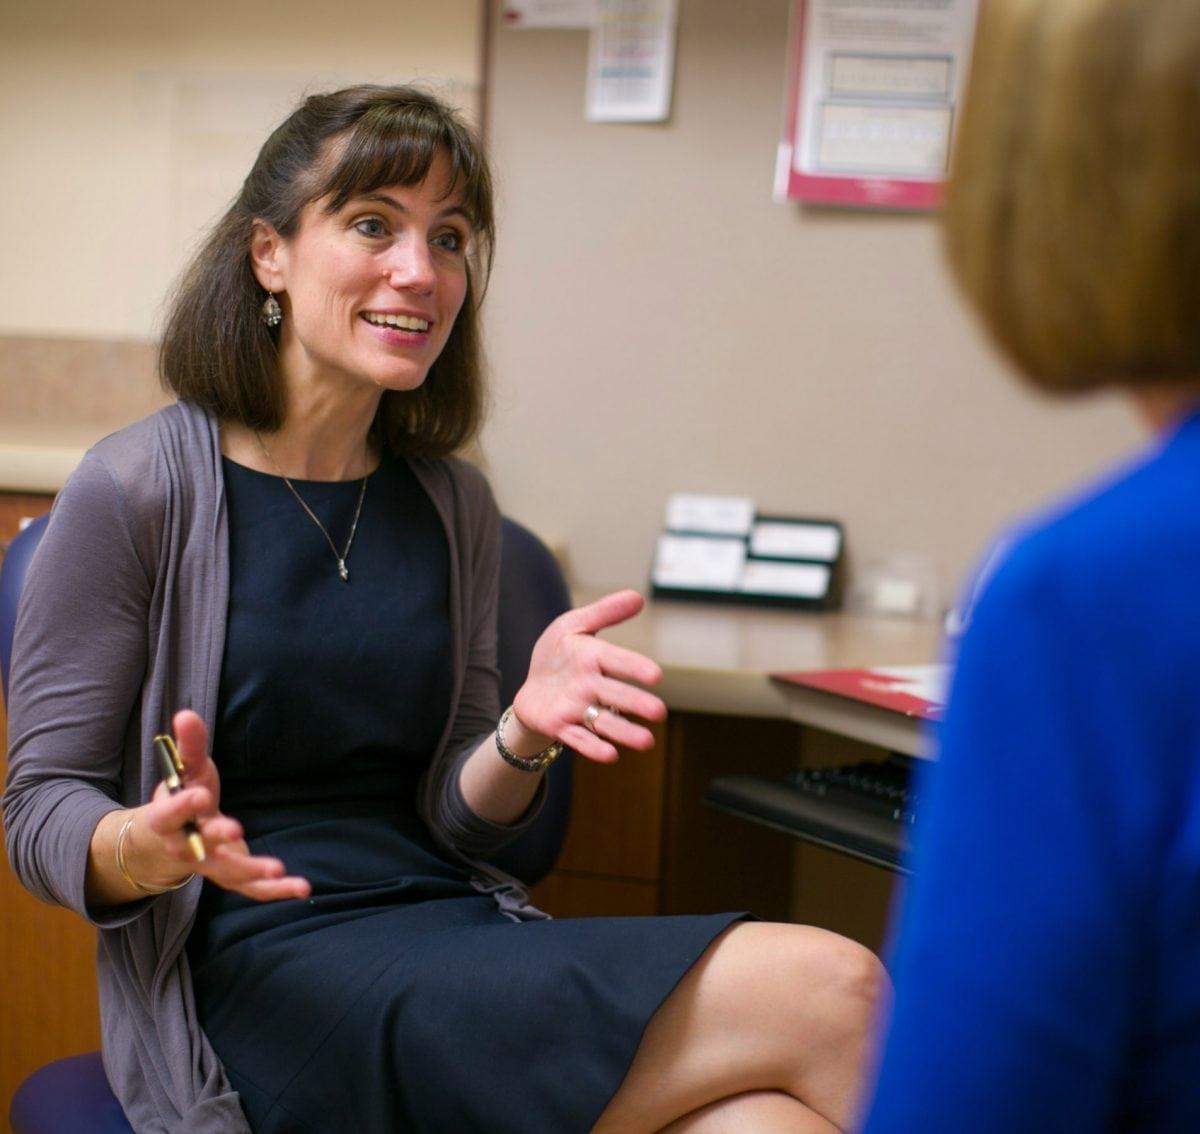 Dr. Schwarze talking to patient